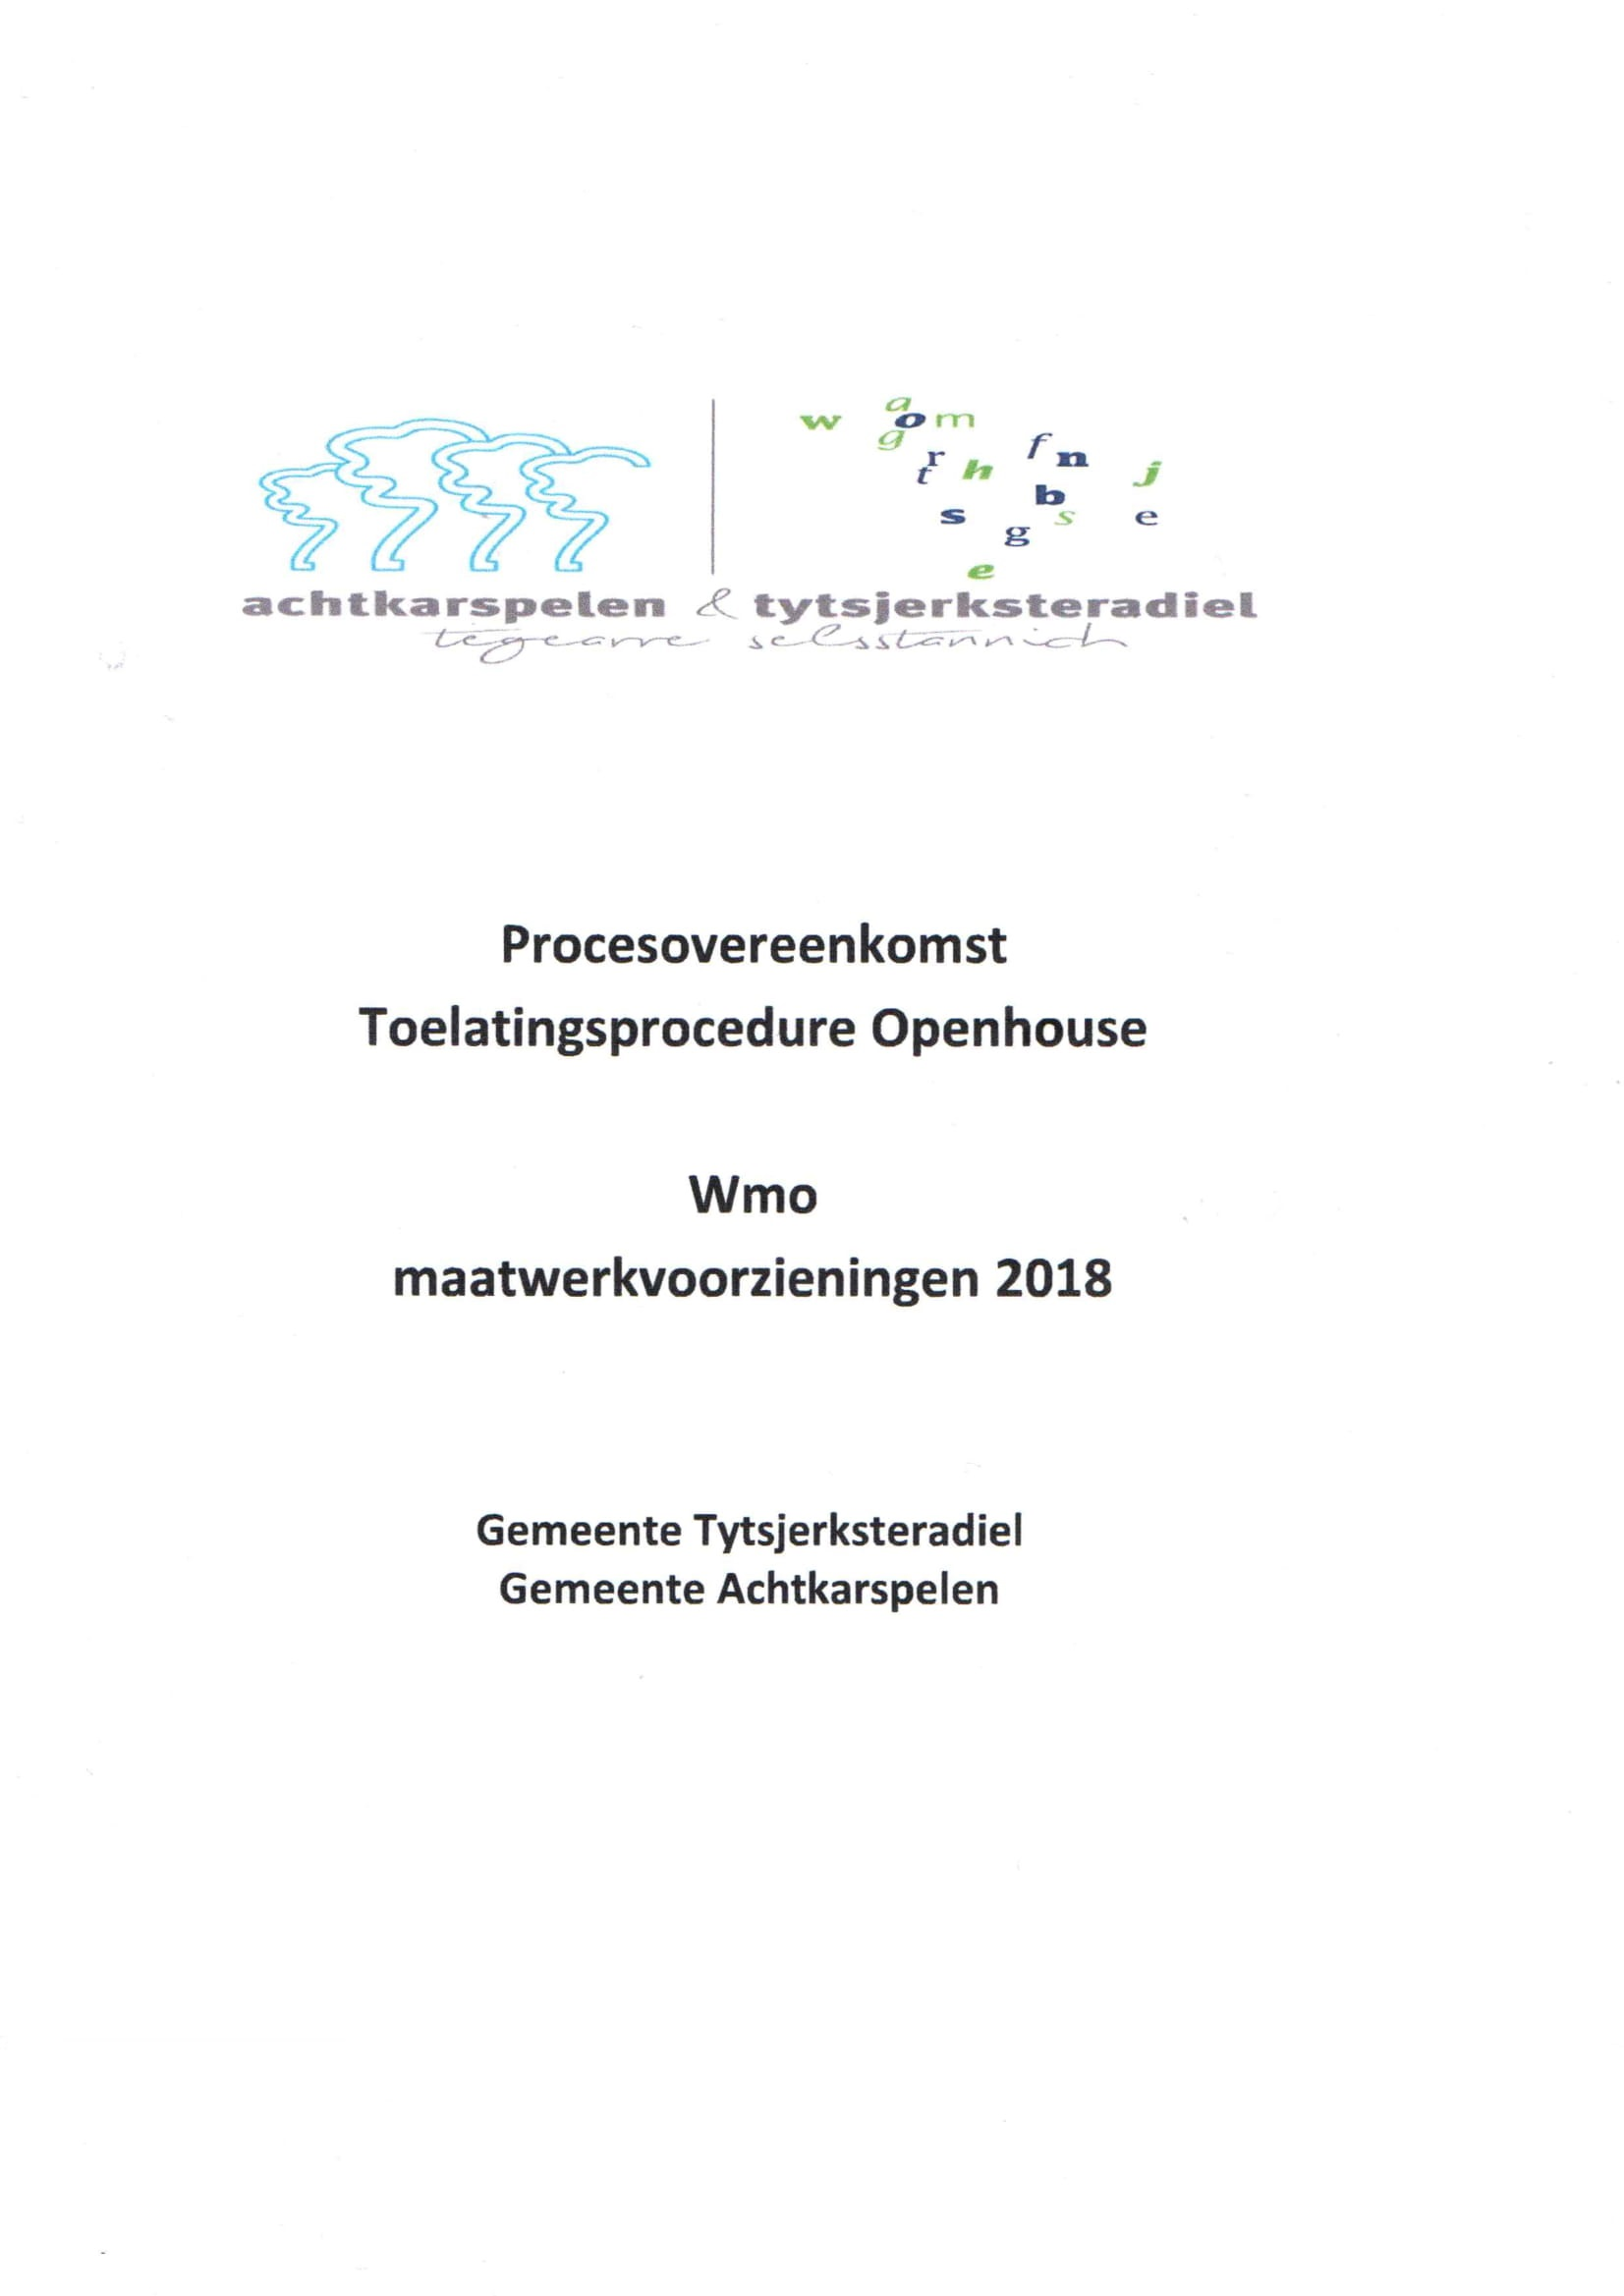 Stichting Strong ID | zorg in 8Karspelen & Tytjersteradiel